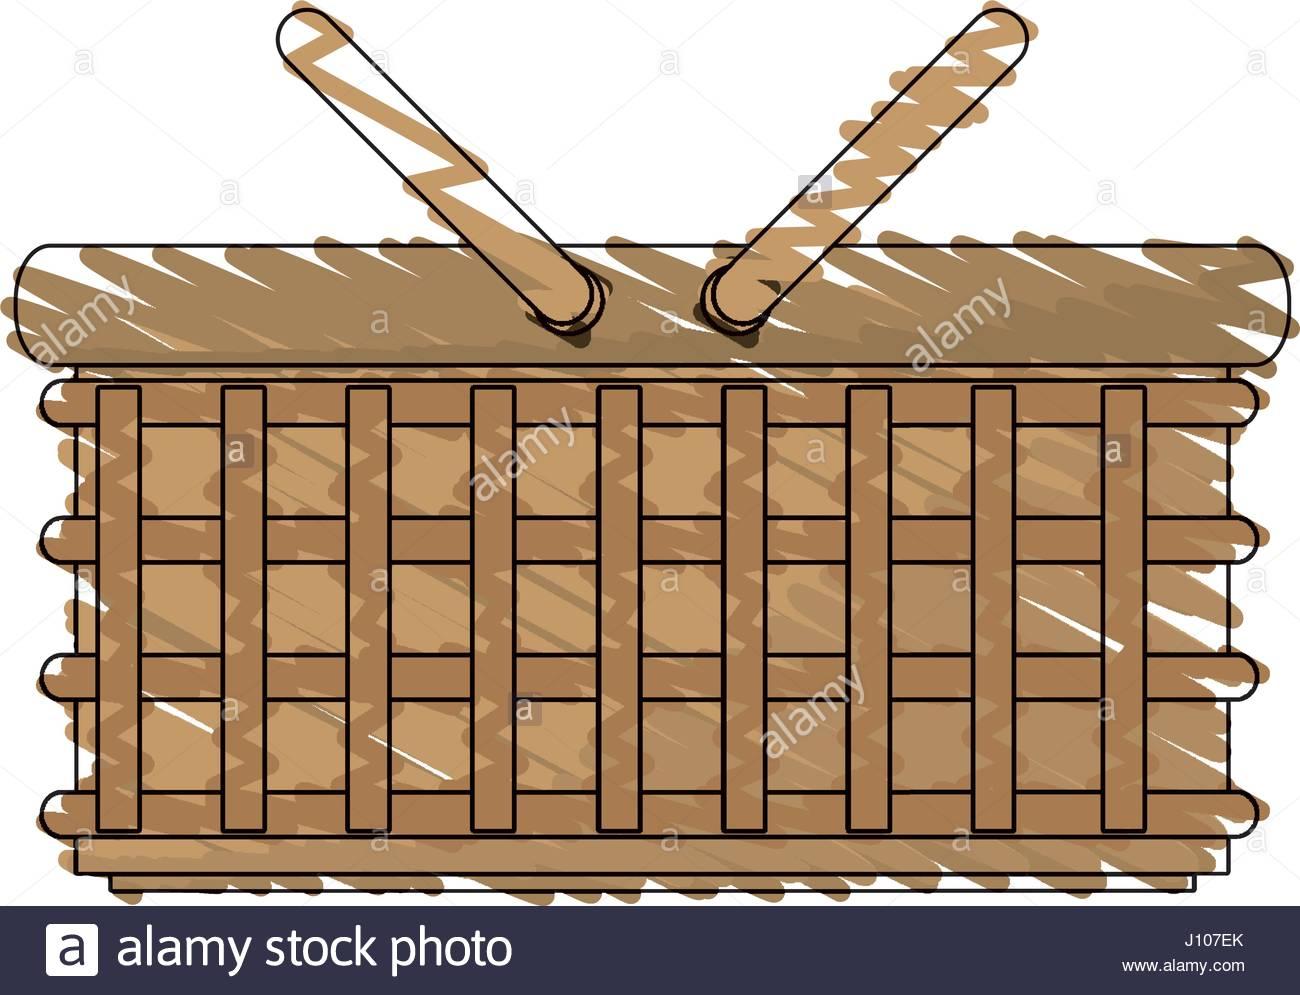 1300x995 Drawing Wicker Basket Picnic Image Stock Vector Art Amp Illustration